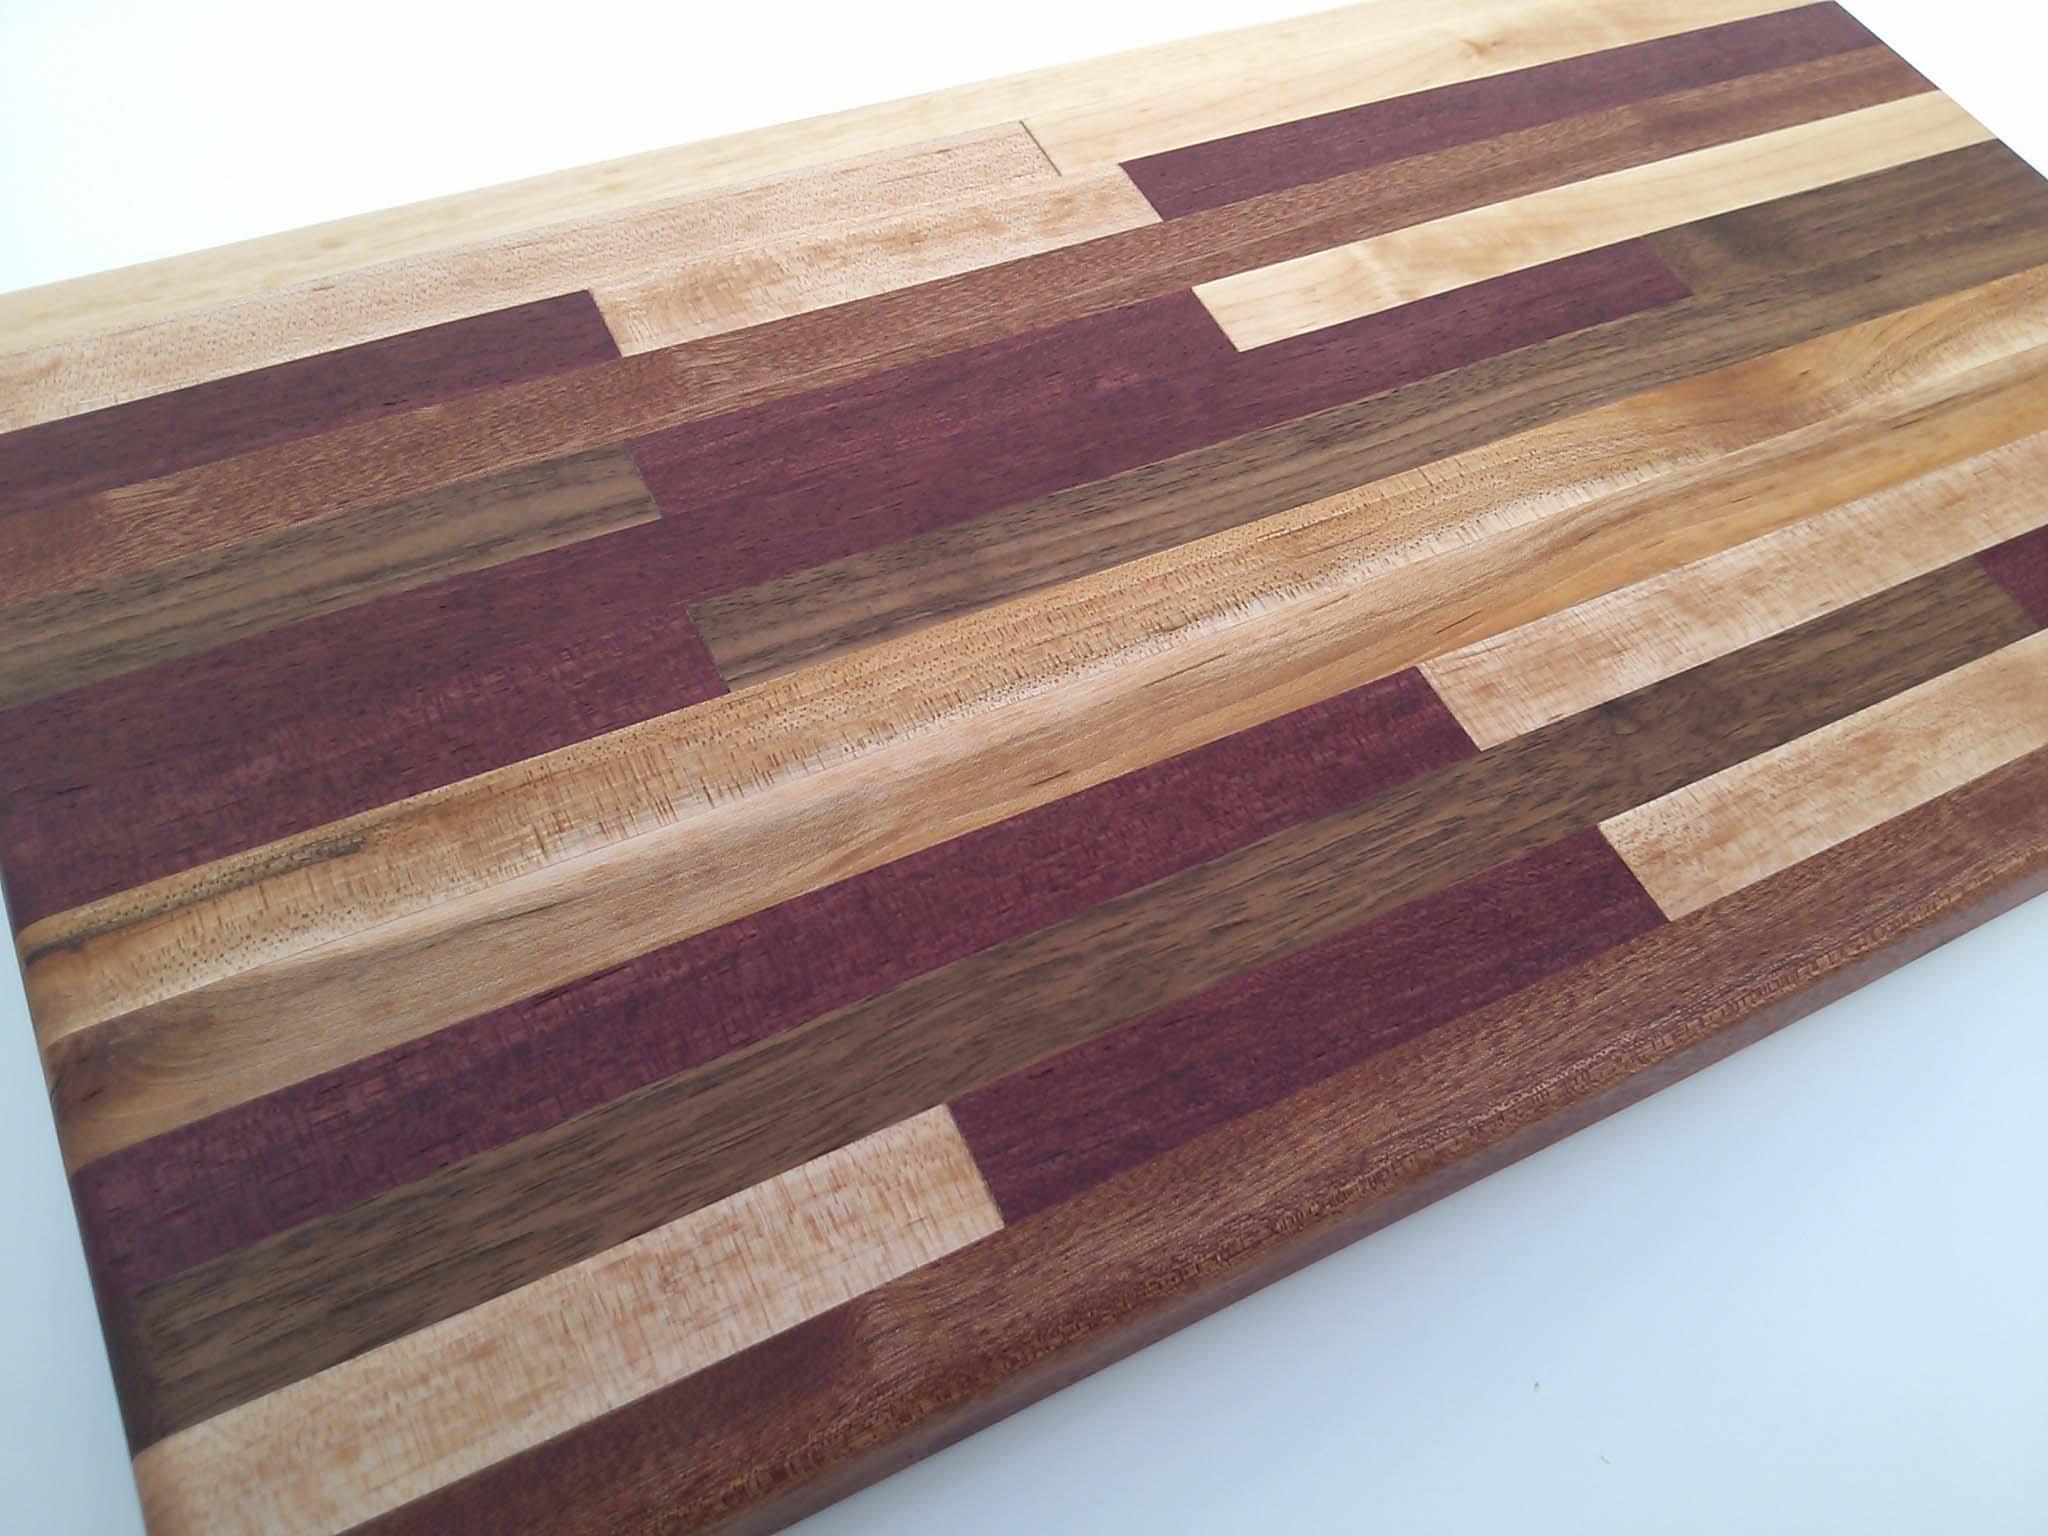 Moasic Cutting Board.jpg